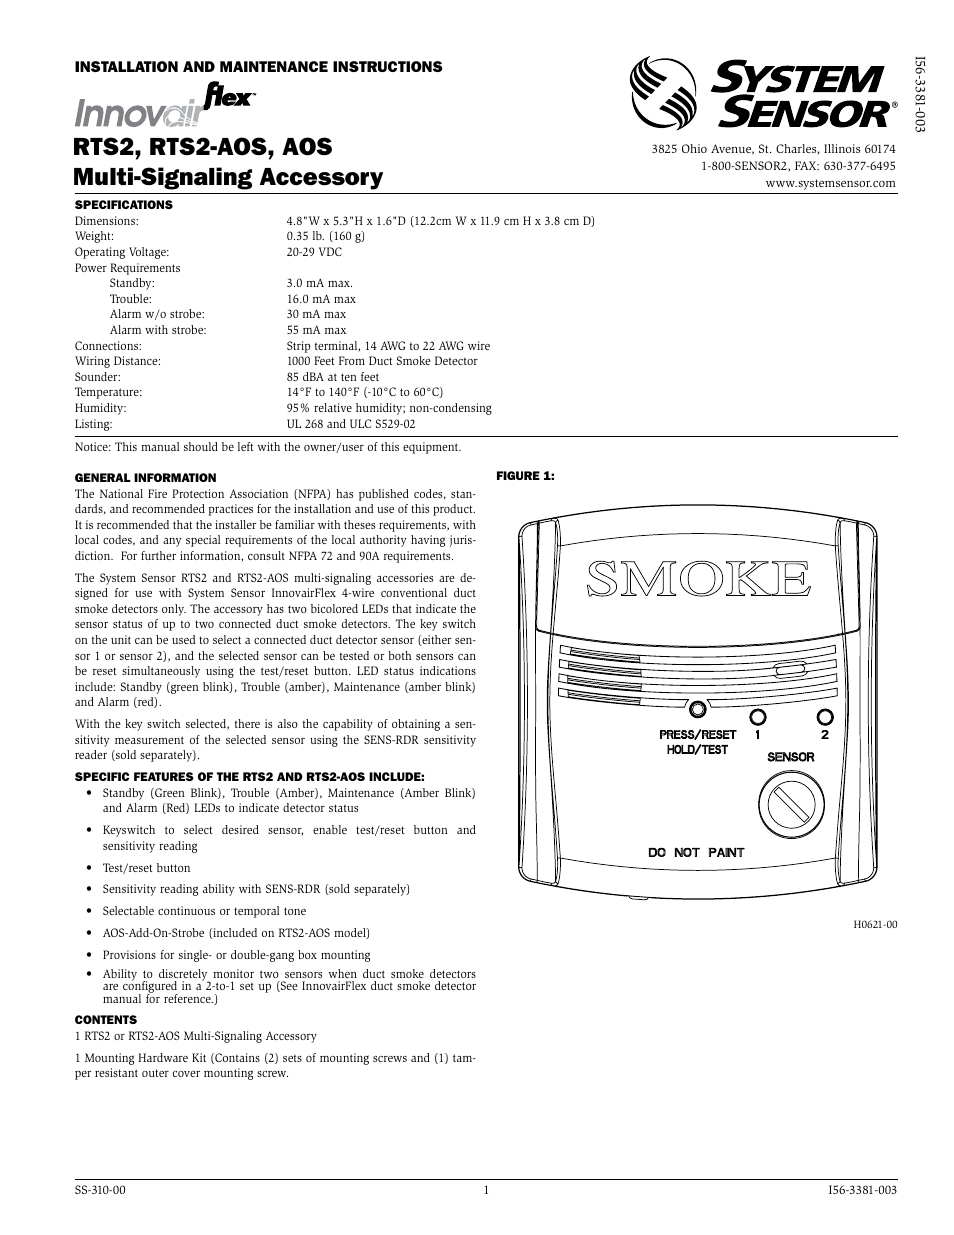 System Sensor Rts